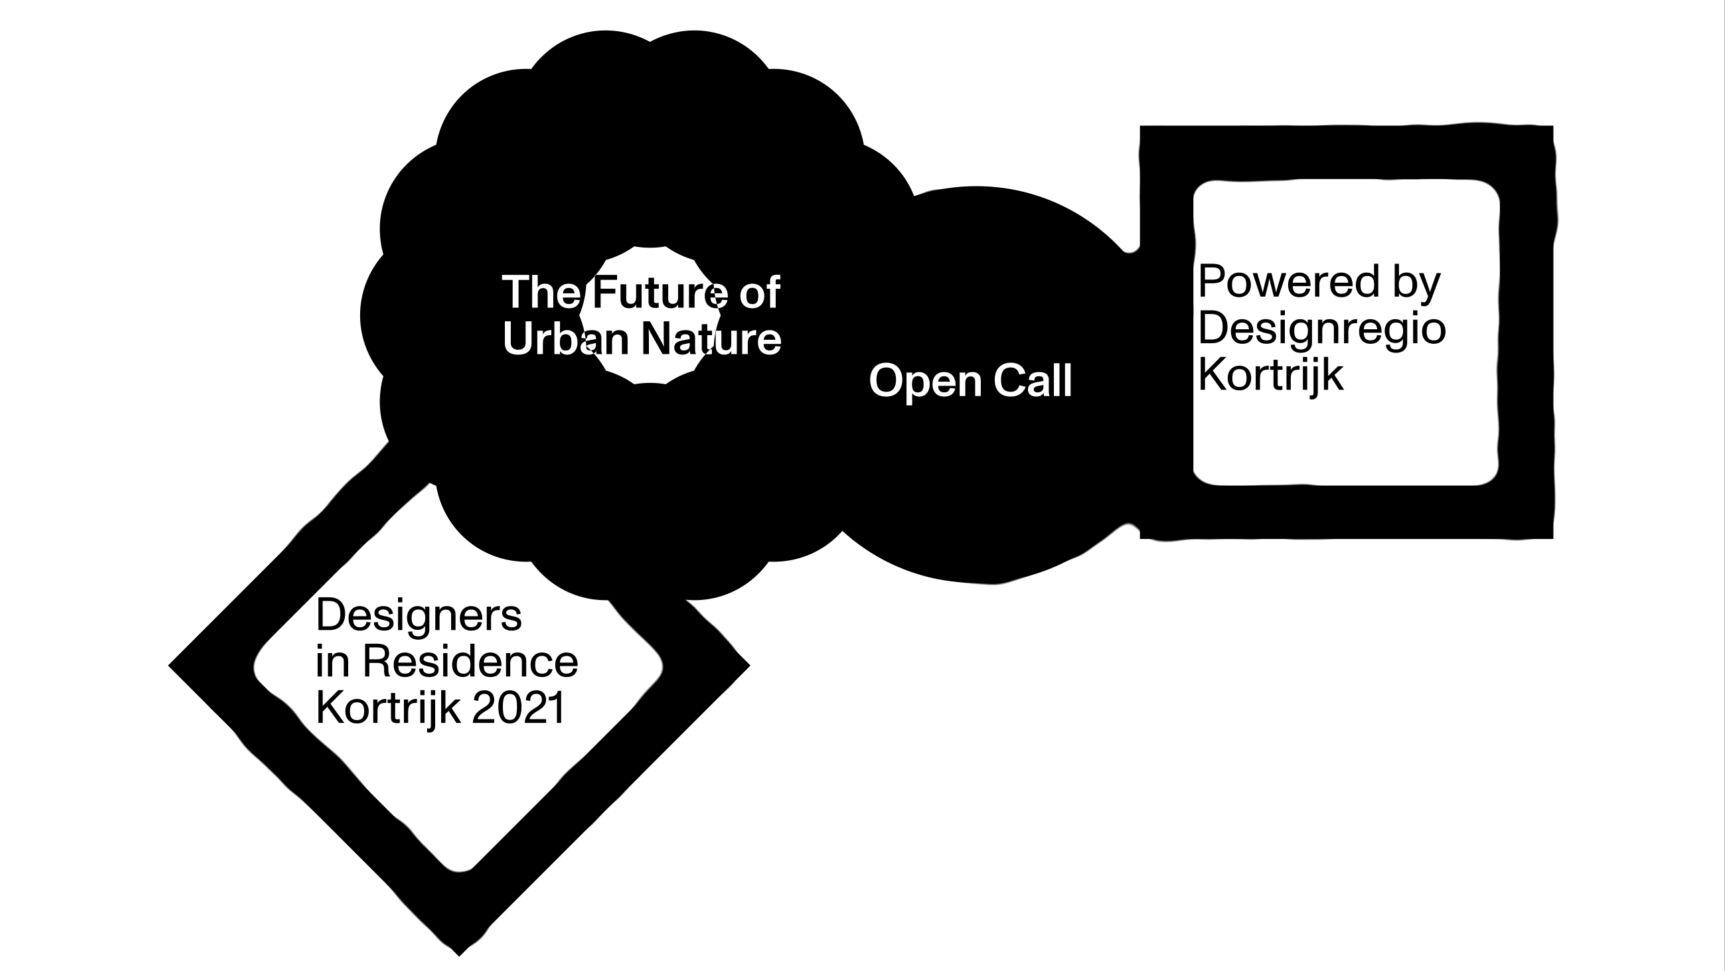 Open Call Designers in Residence Kortrijk 2021